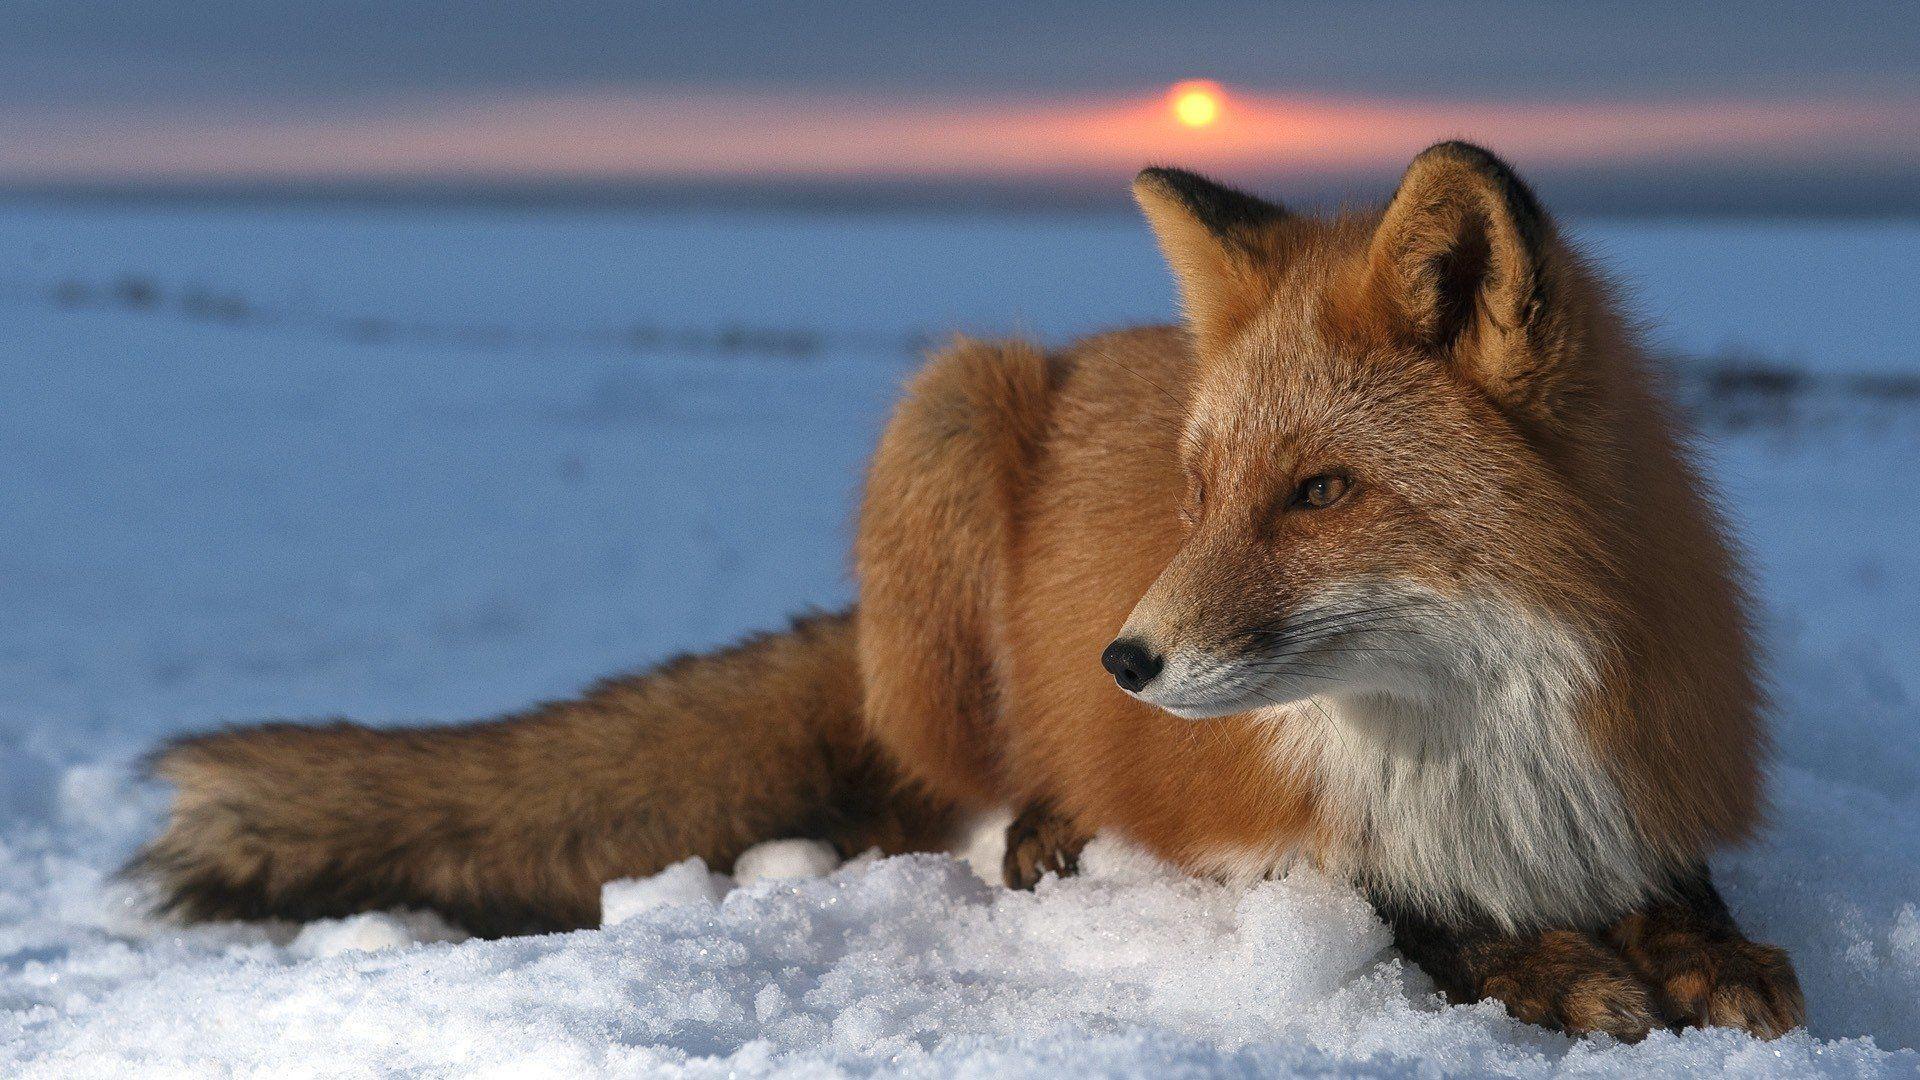 Fox Wallpapers Top Free Fox Backgrounds Wallpaperaccess